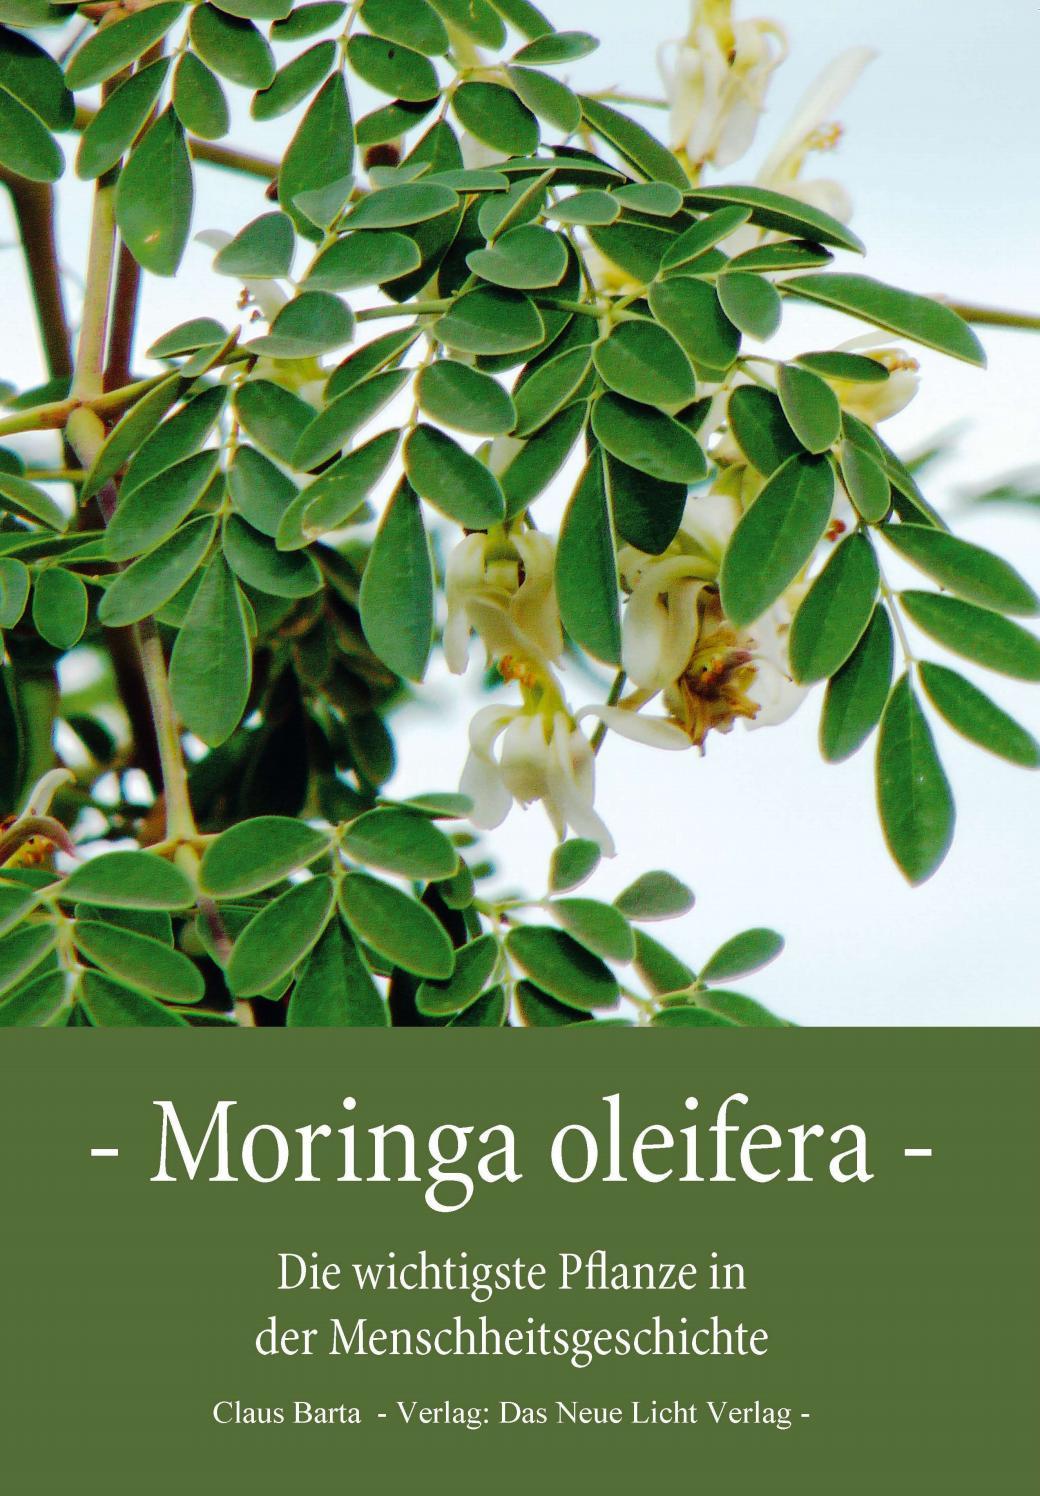 Moringa dient zum Abnehmen